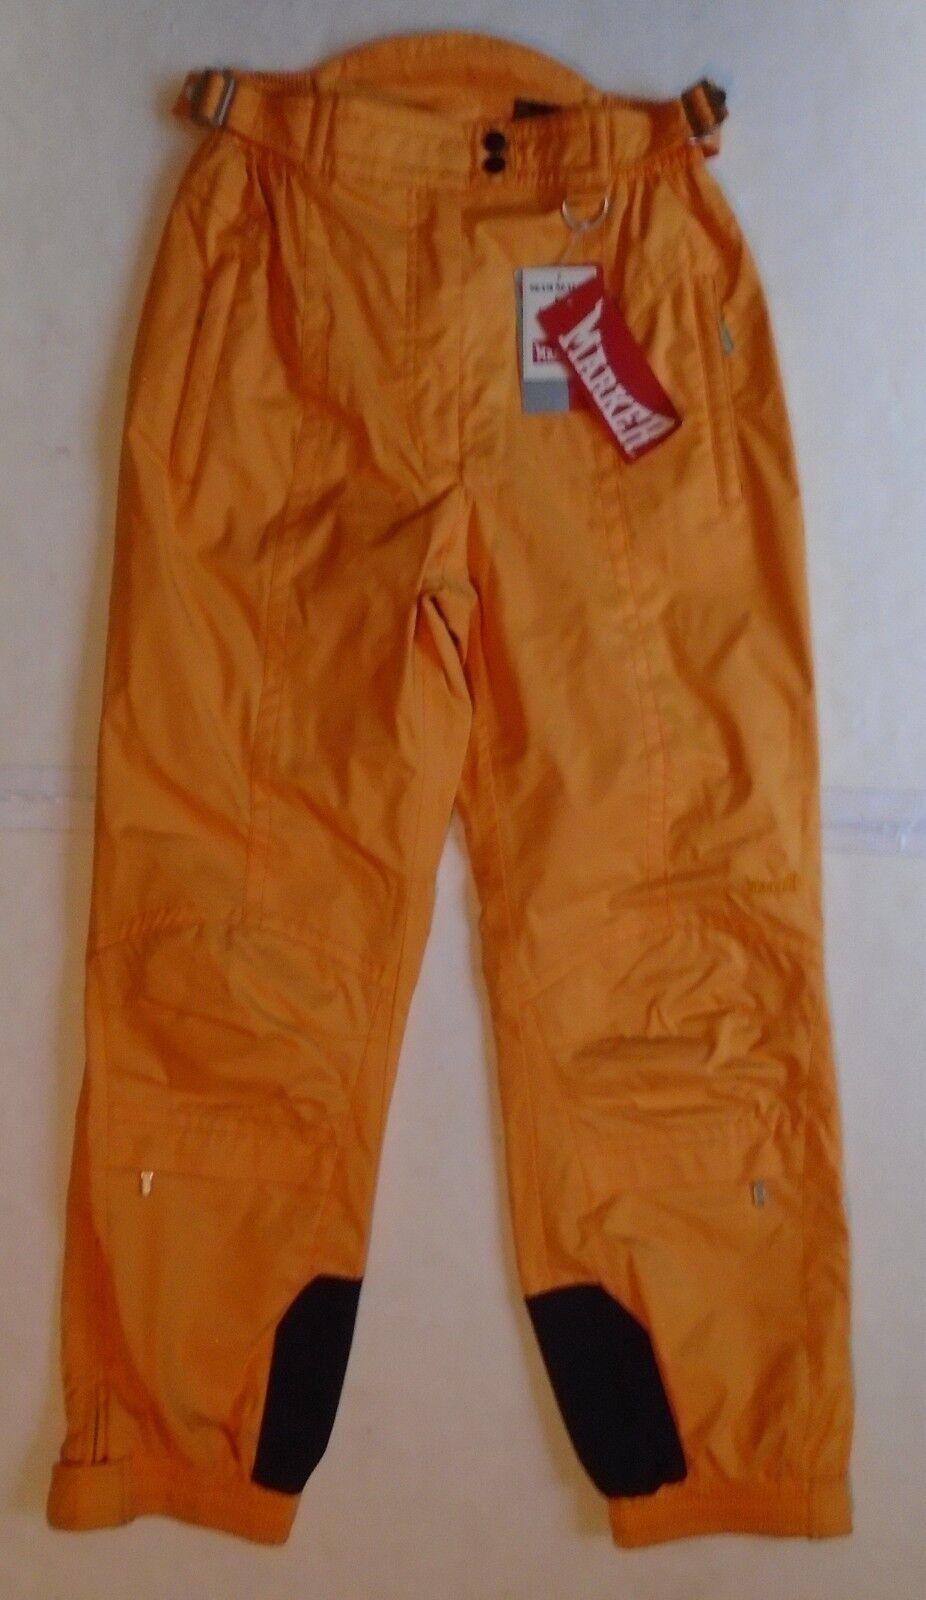 NWT Marker Womens size 8 Waistpant Insulated Snow Ski Pants Mango orange